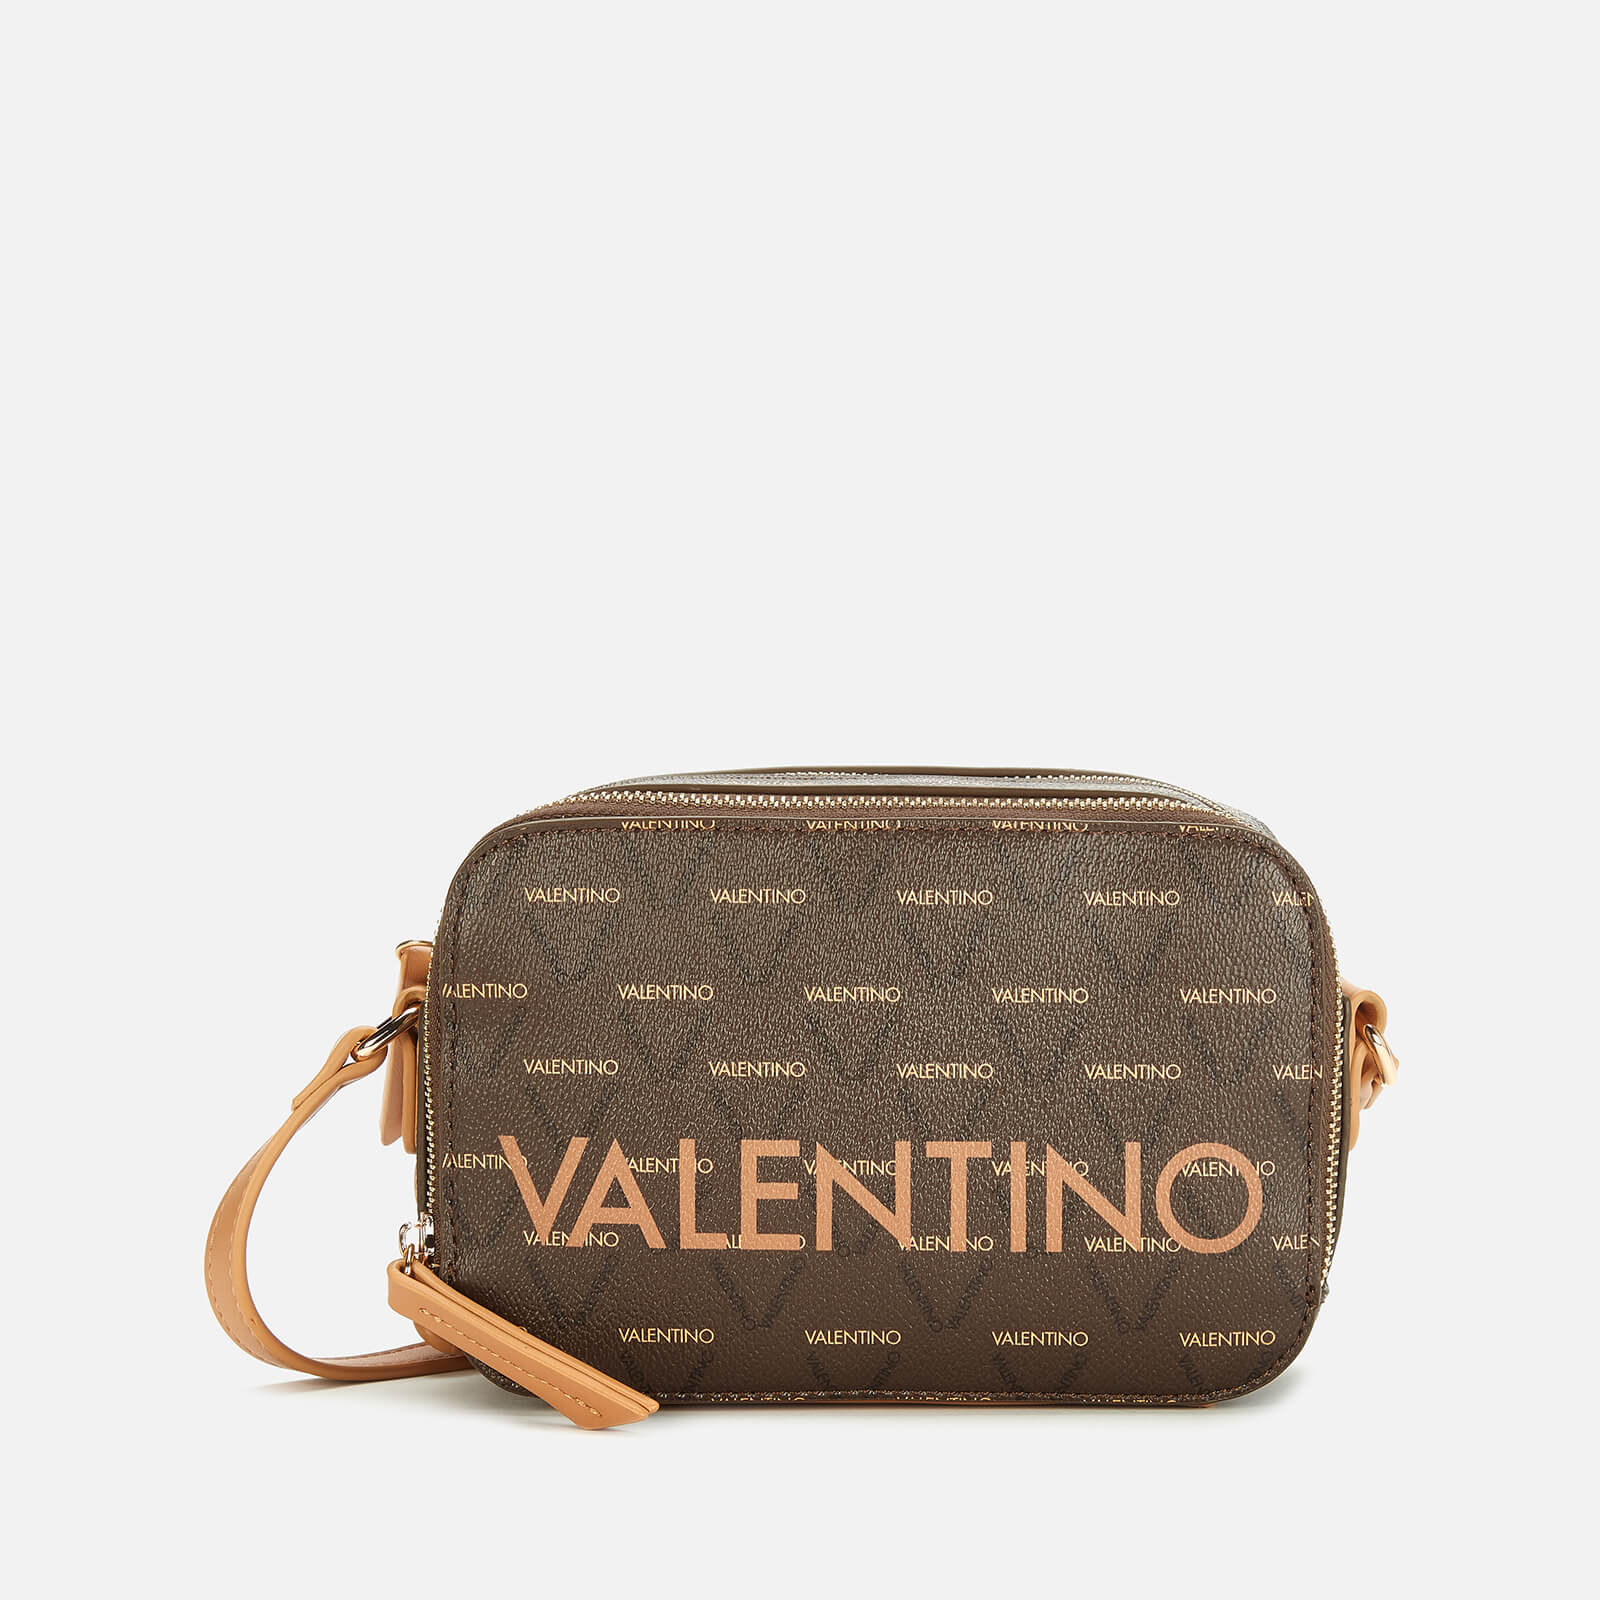 Valentino Bags Women's Liuto Camera Bag - Tan/Multi